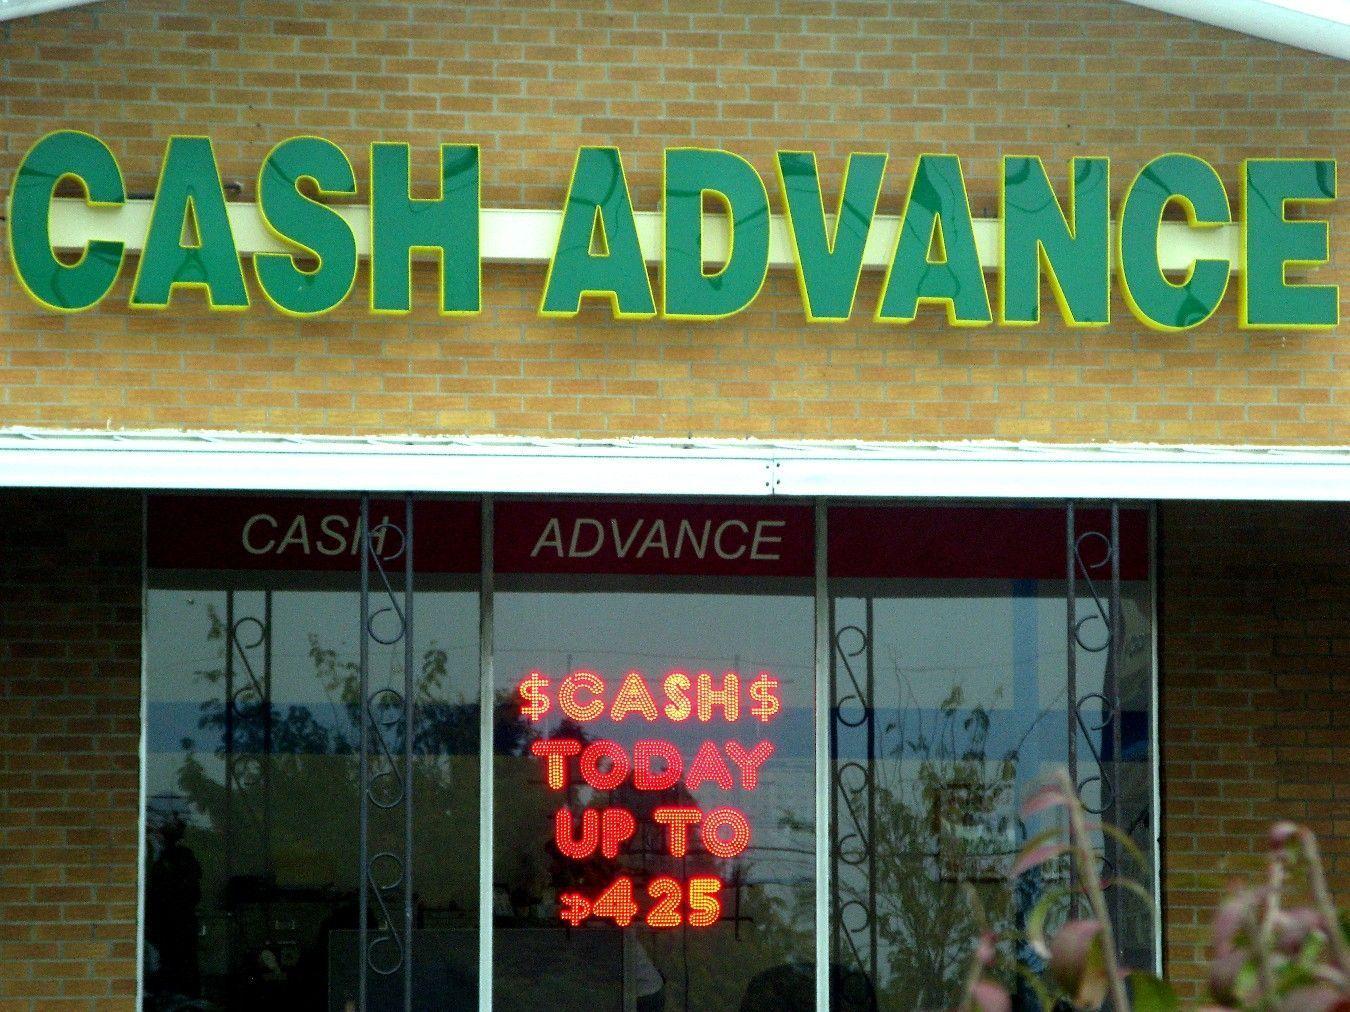 Payday loan algorithm image 6